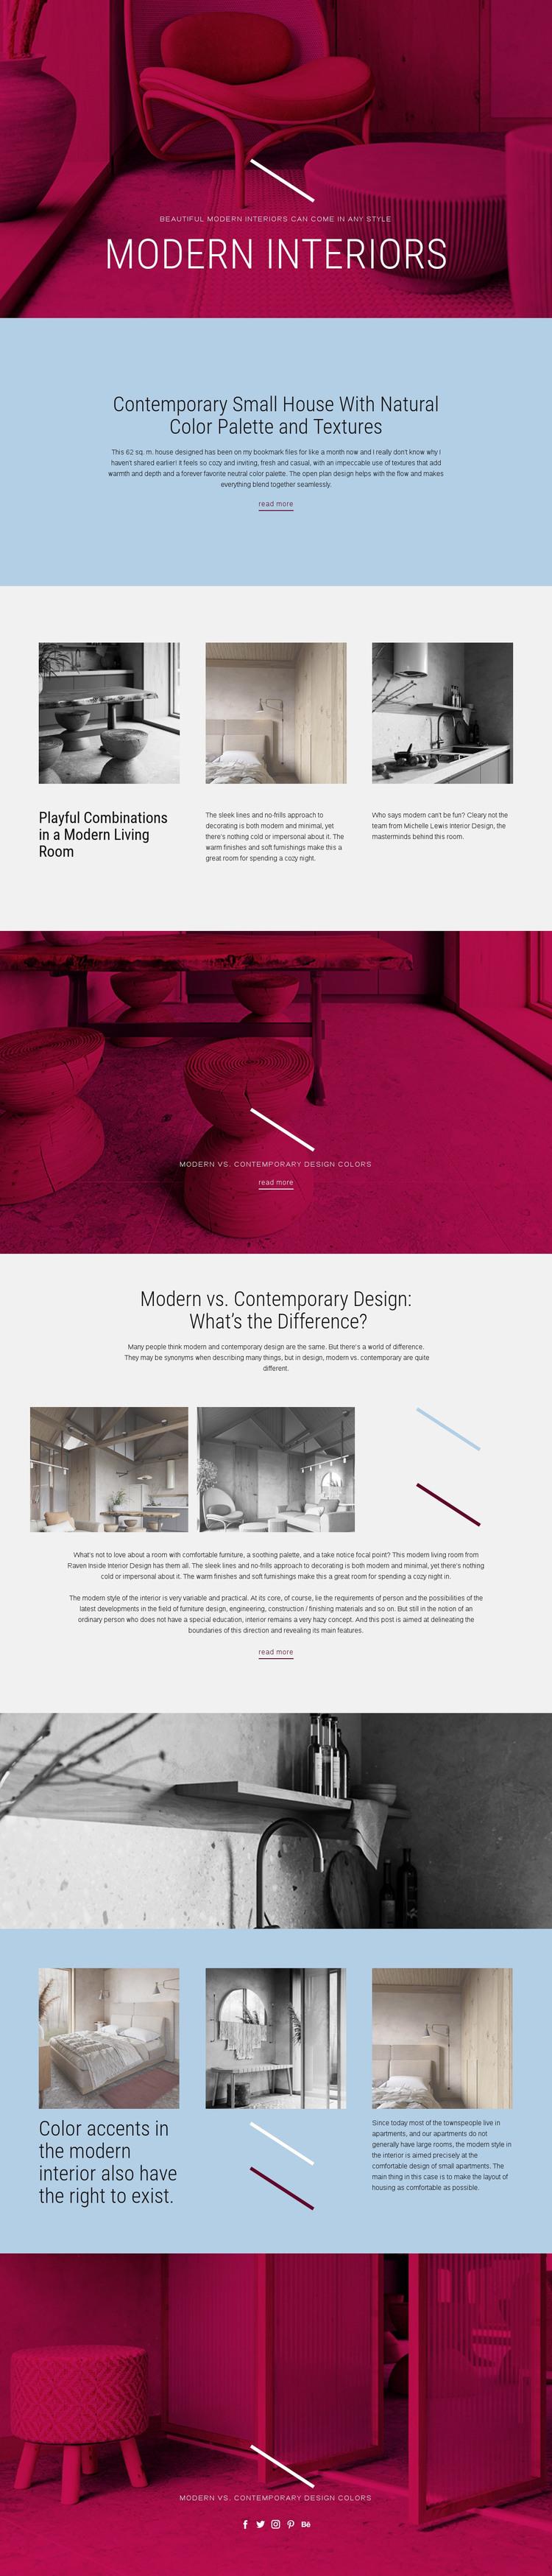 Art Nouveau furniture Web Design